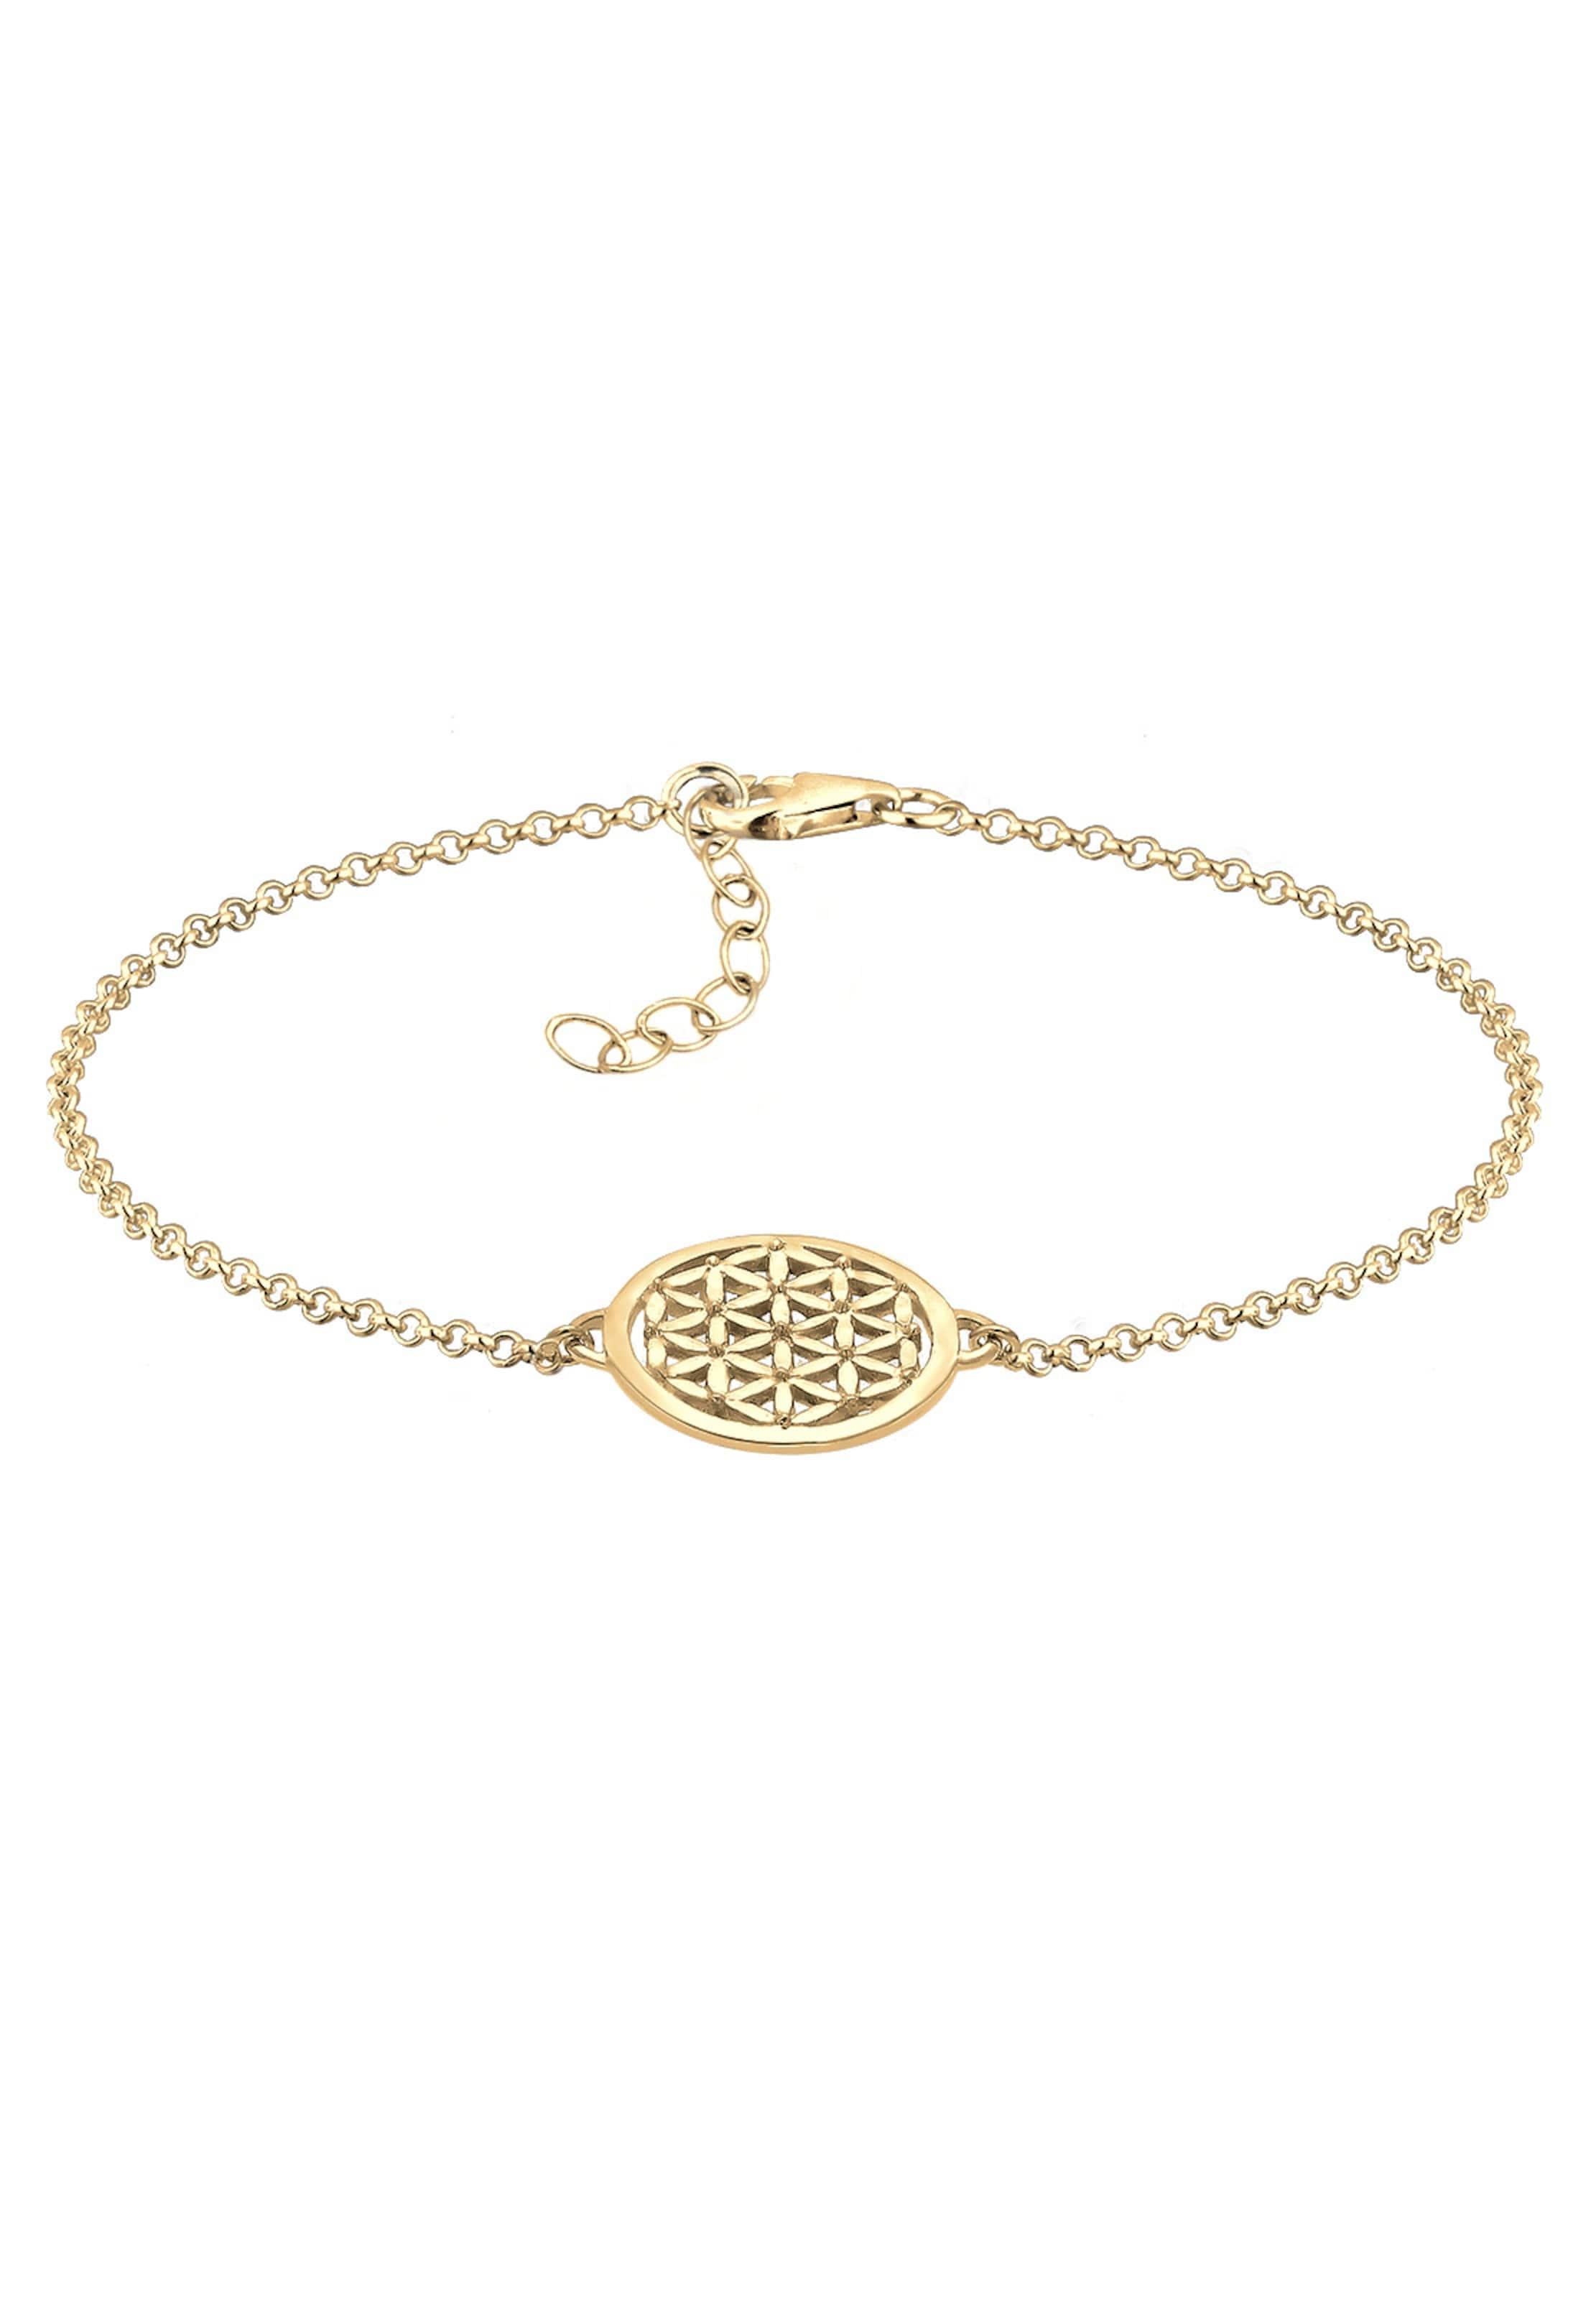 Elli In Elli Armband Armband Gold In Elli Gold 7f6bgy